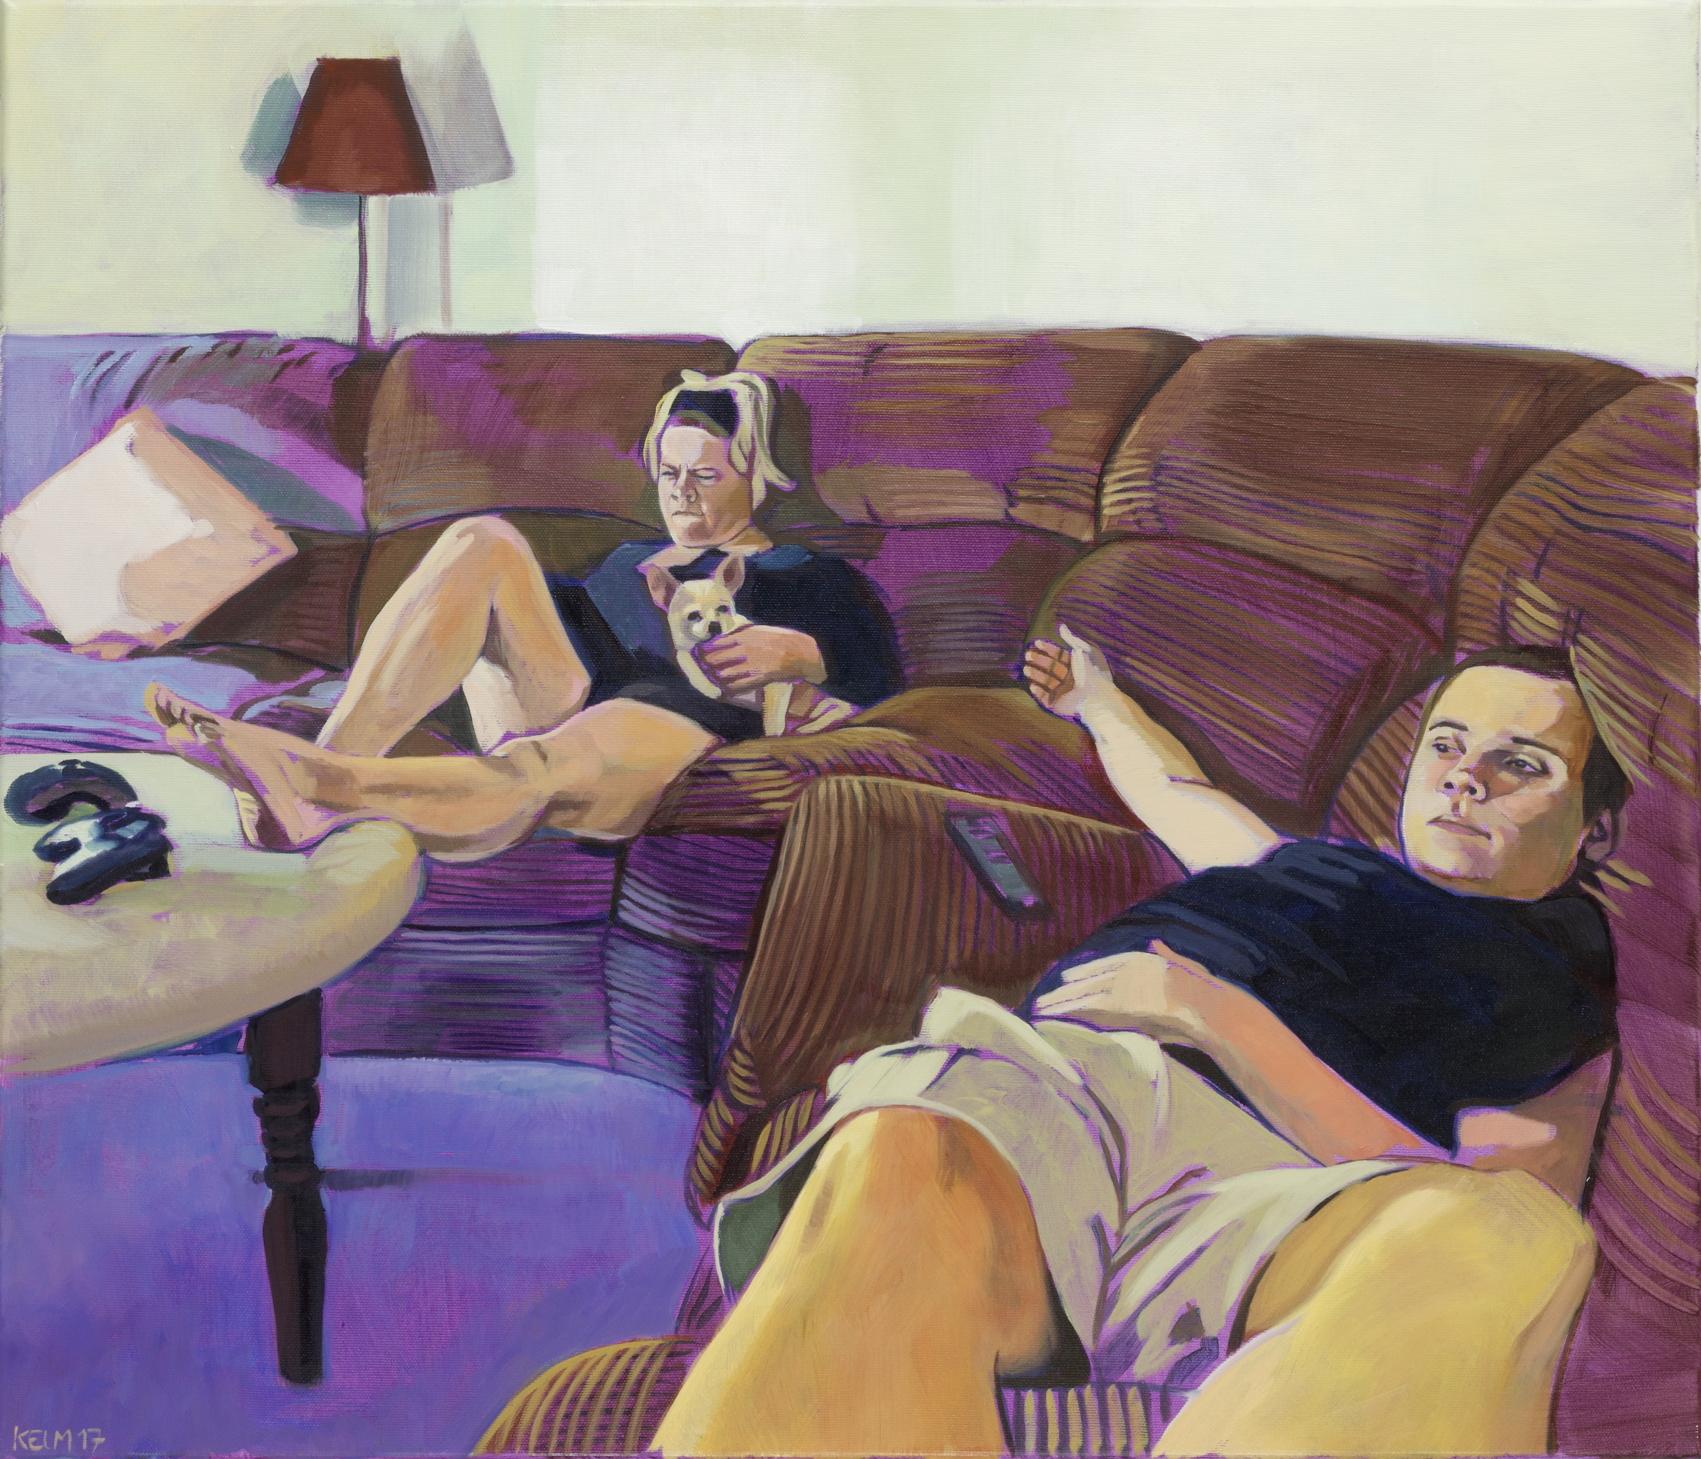 Garth 2, 2017, Öl auf Leinwand, 60 x 70